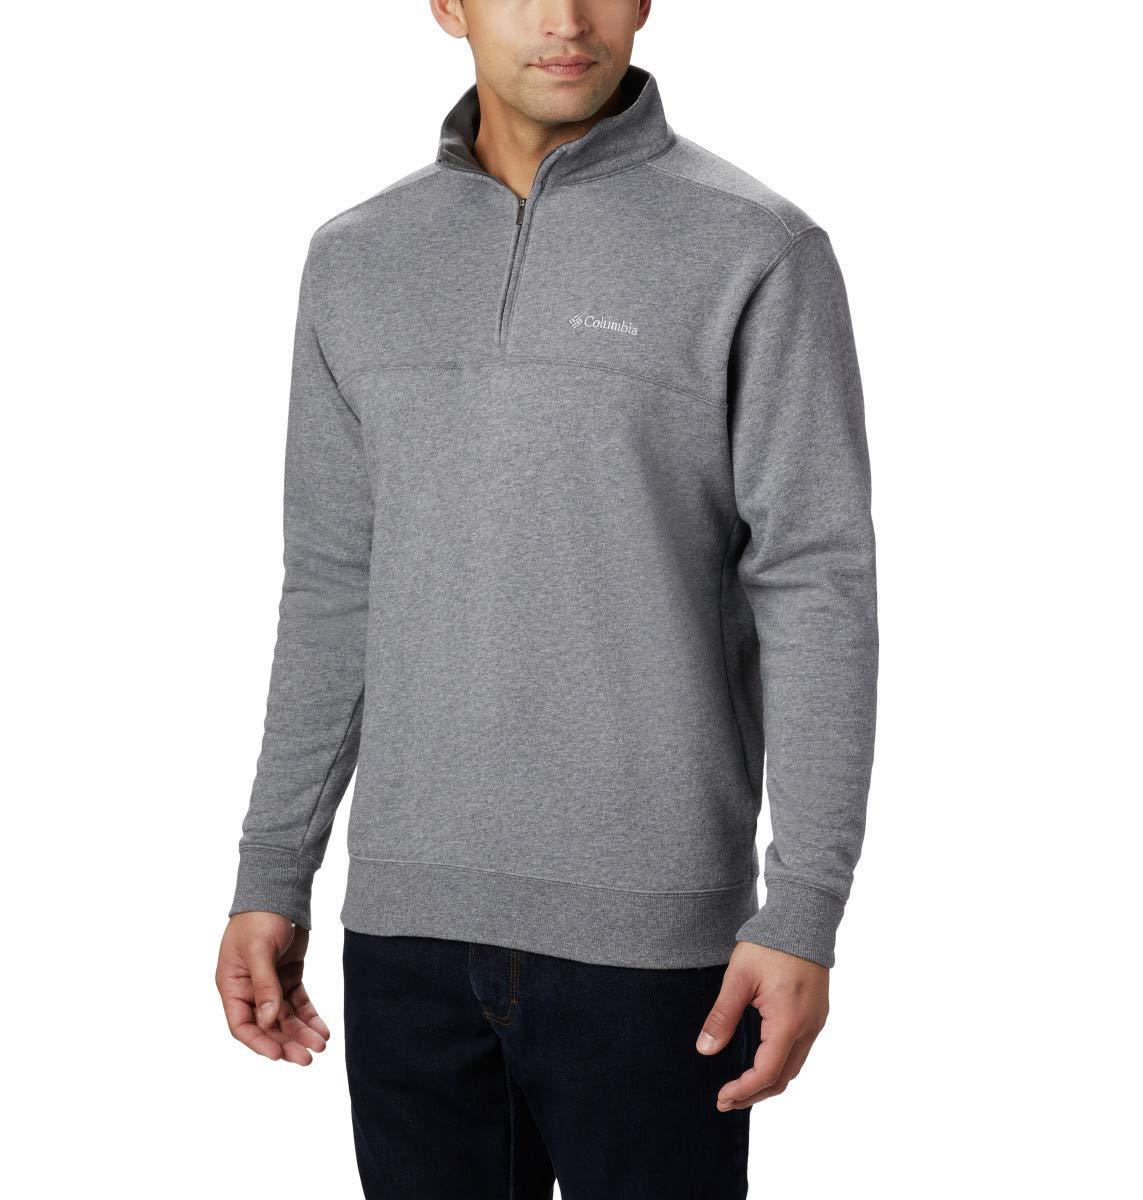 Columbia Men's Hart II Half-Zip Jacket, Charcoal Heather, Small by Columbia